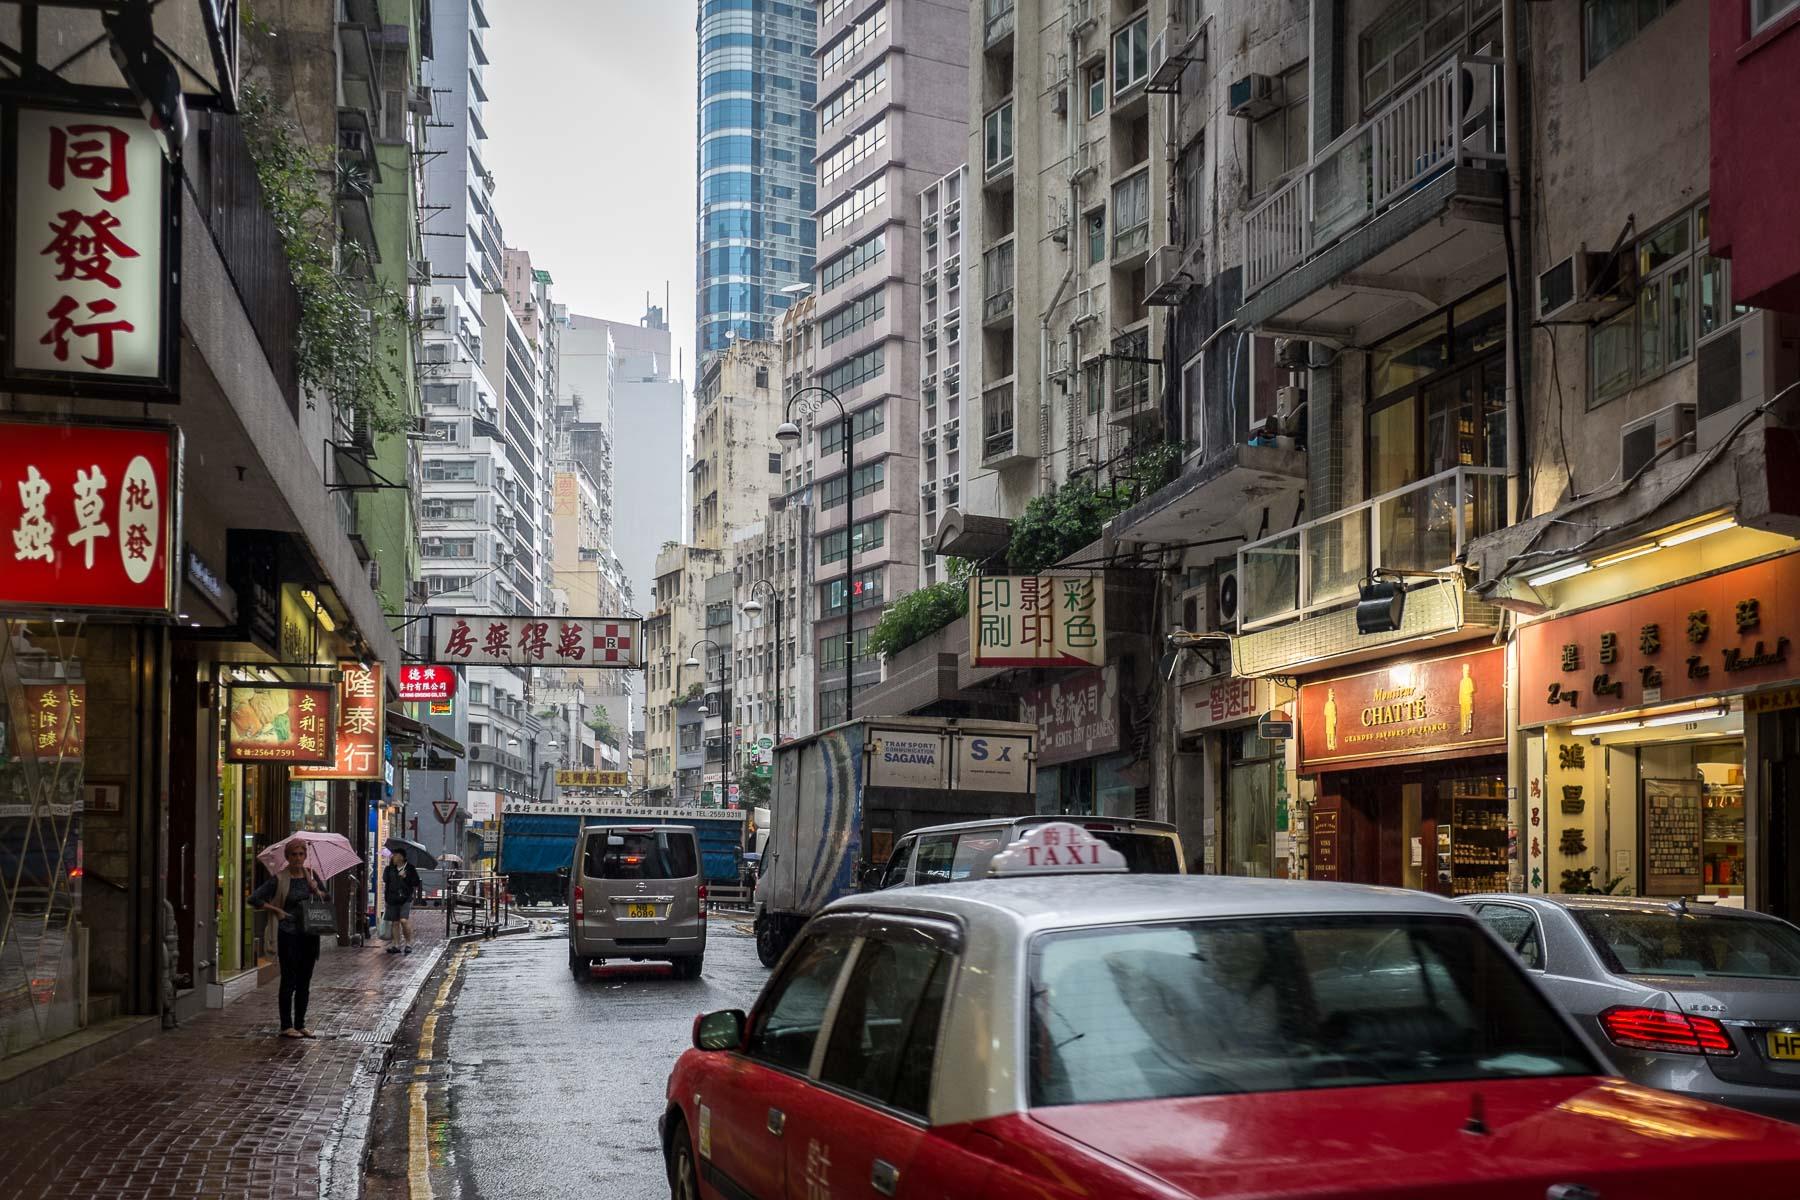 HK 2016 (15 of 66)